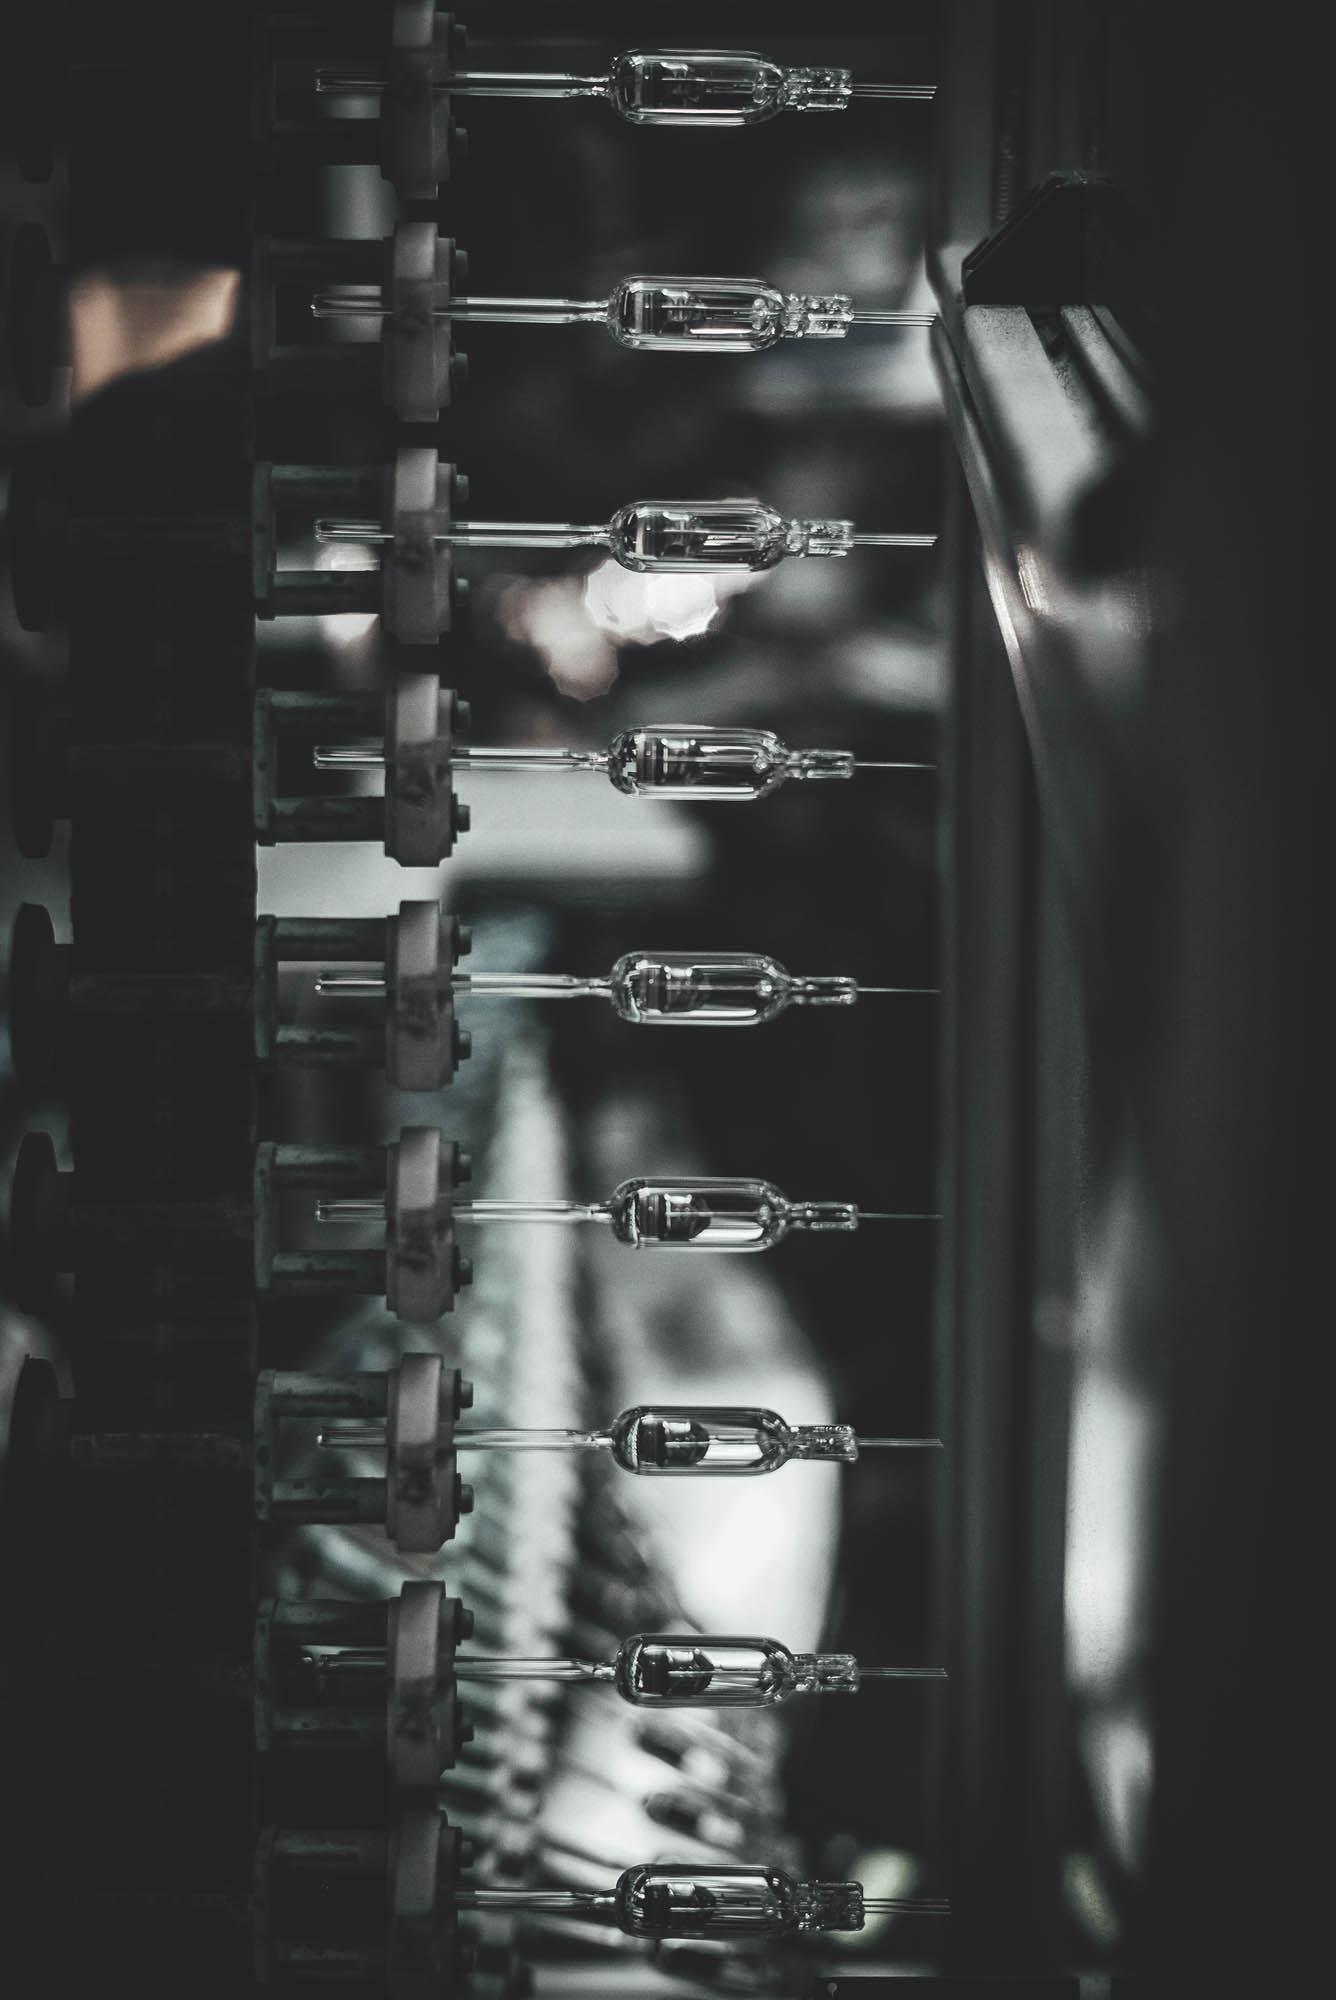 seifertuebler-corporate-osram-filamentbulb-12.jpg